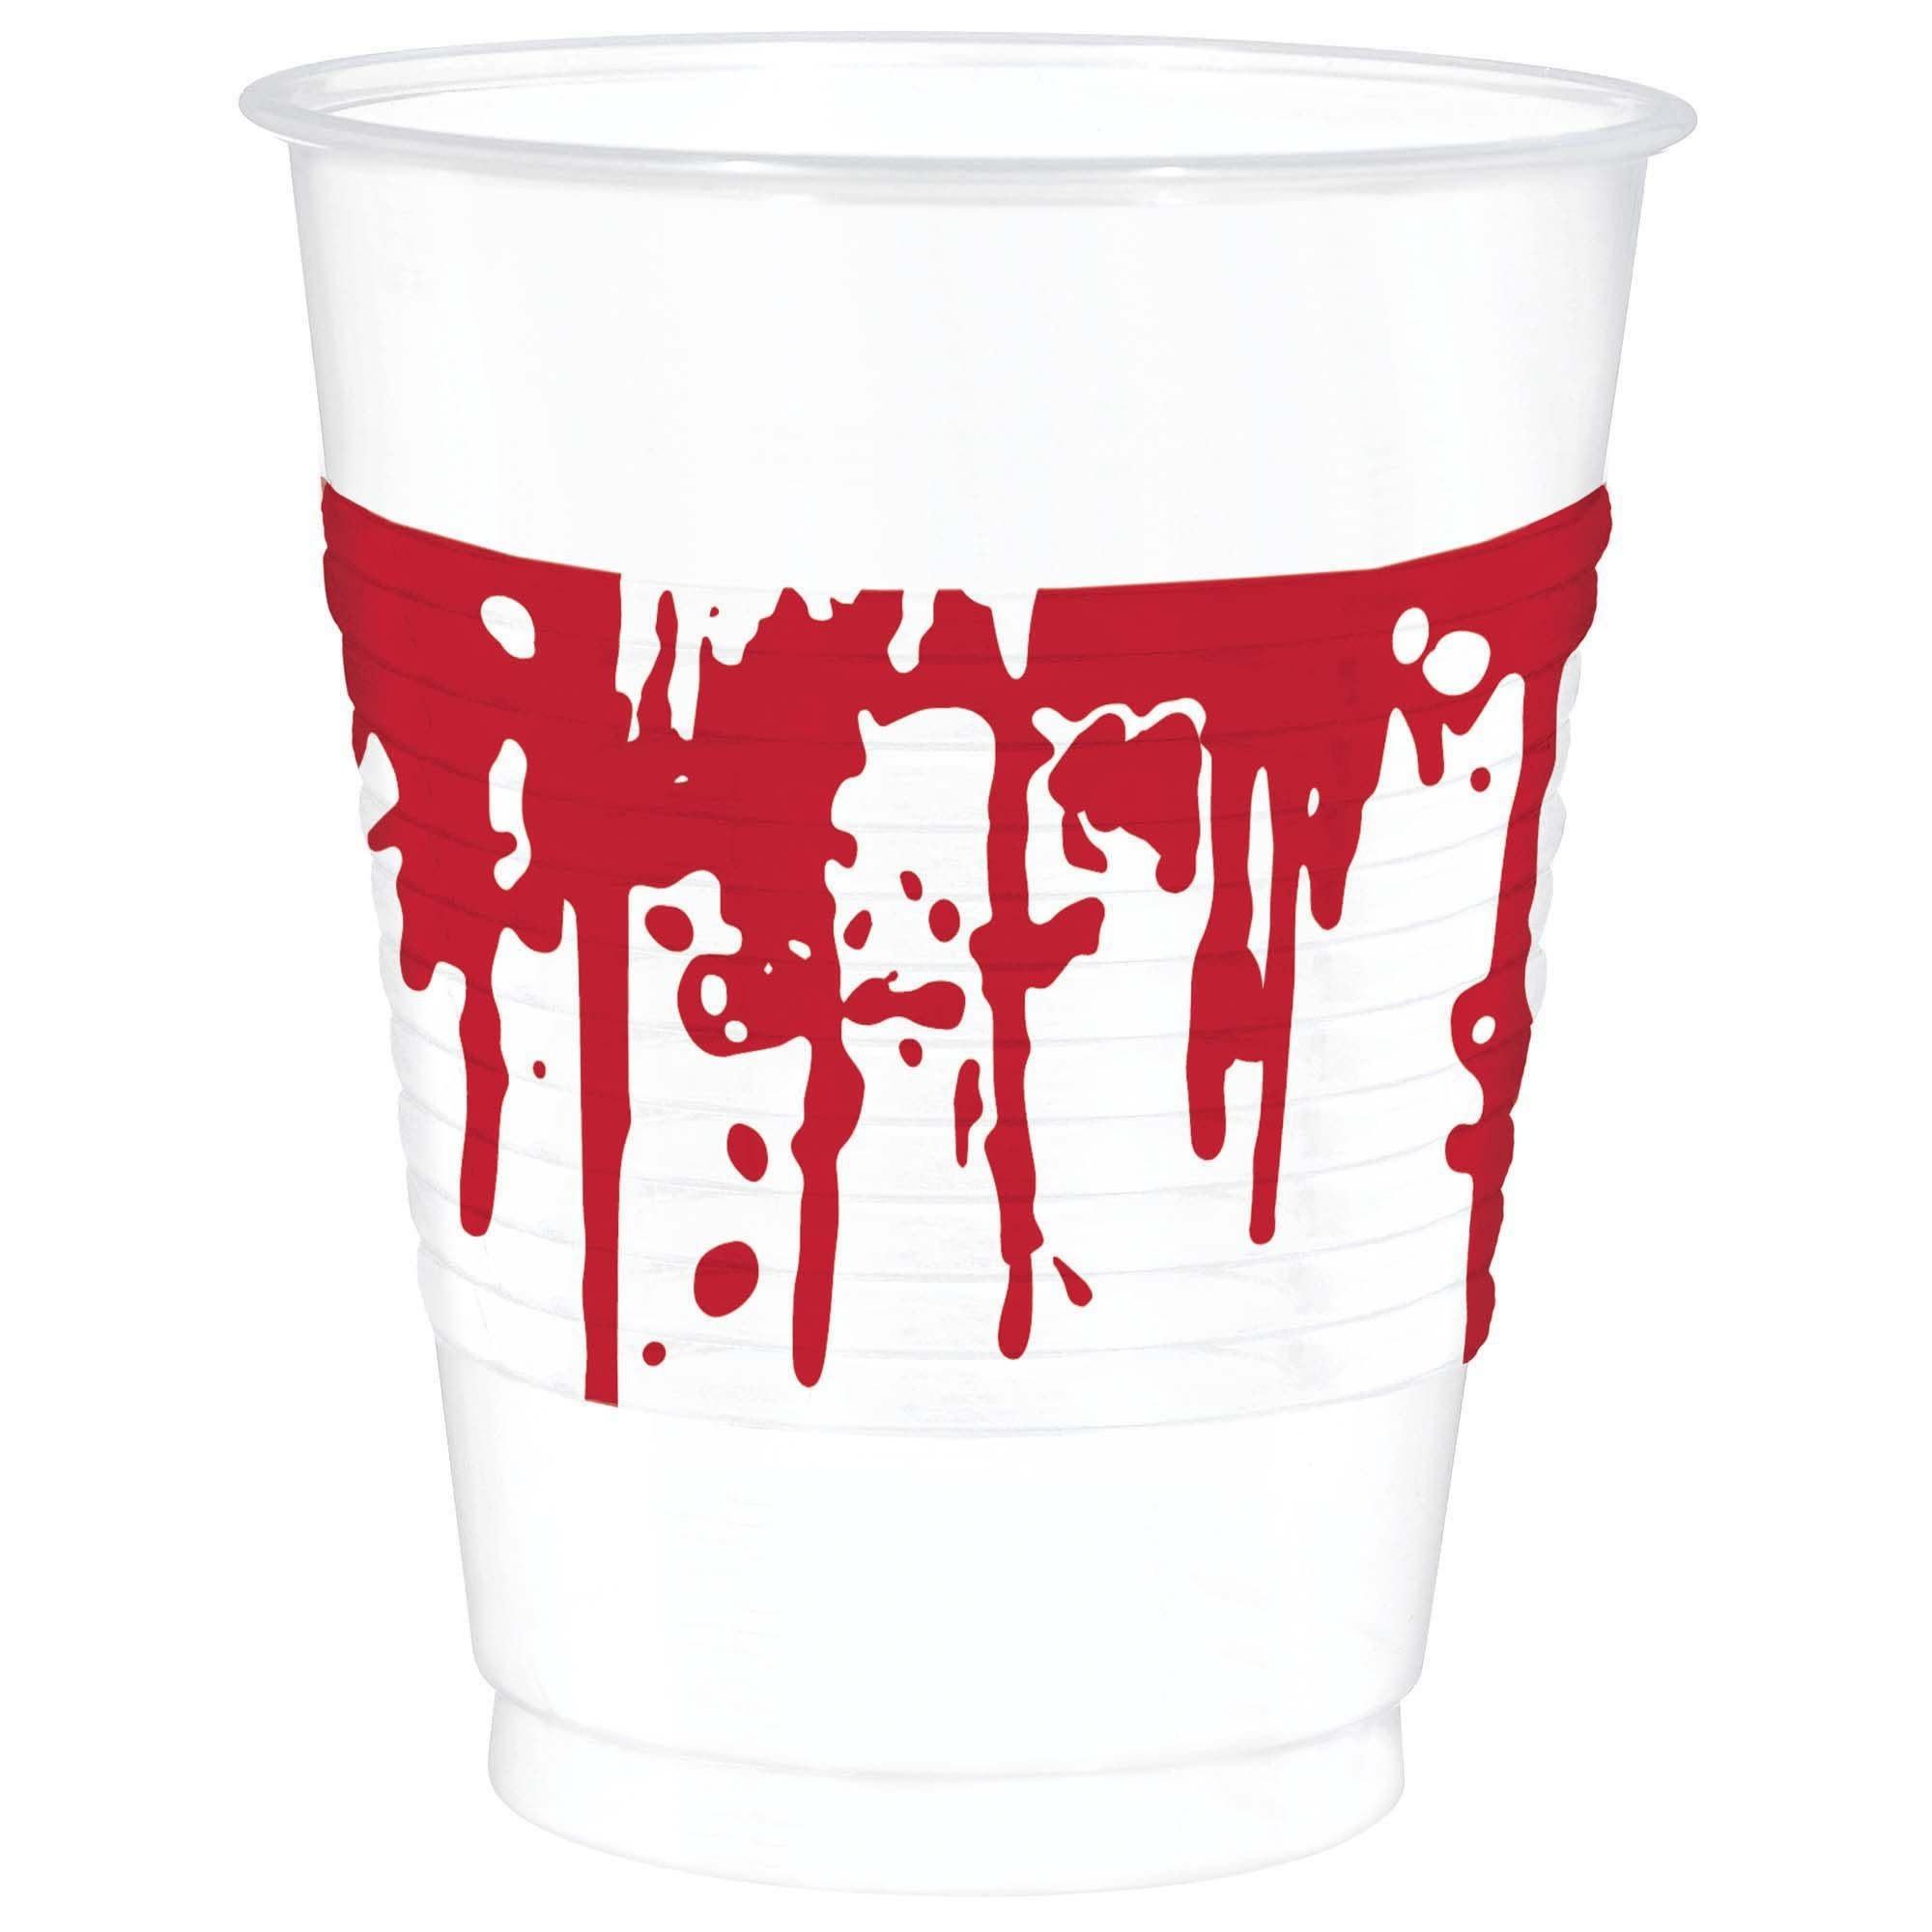 Blood Splattered Printed Cups